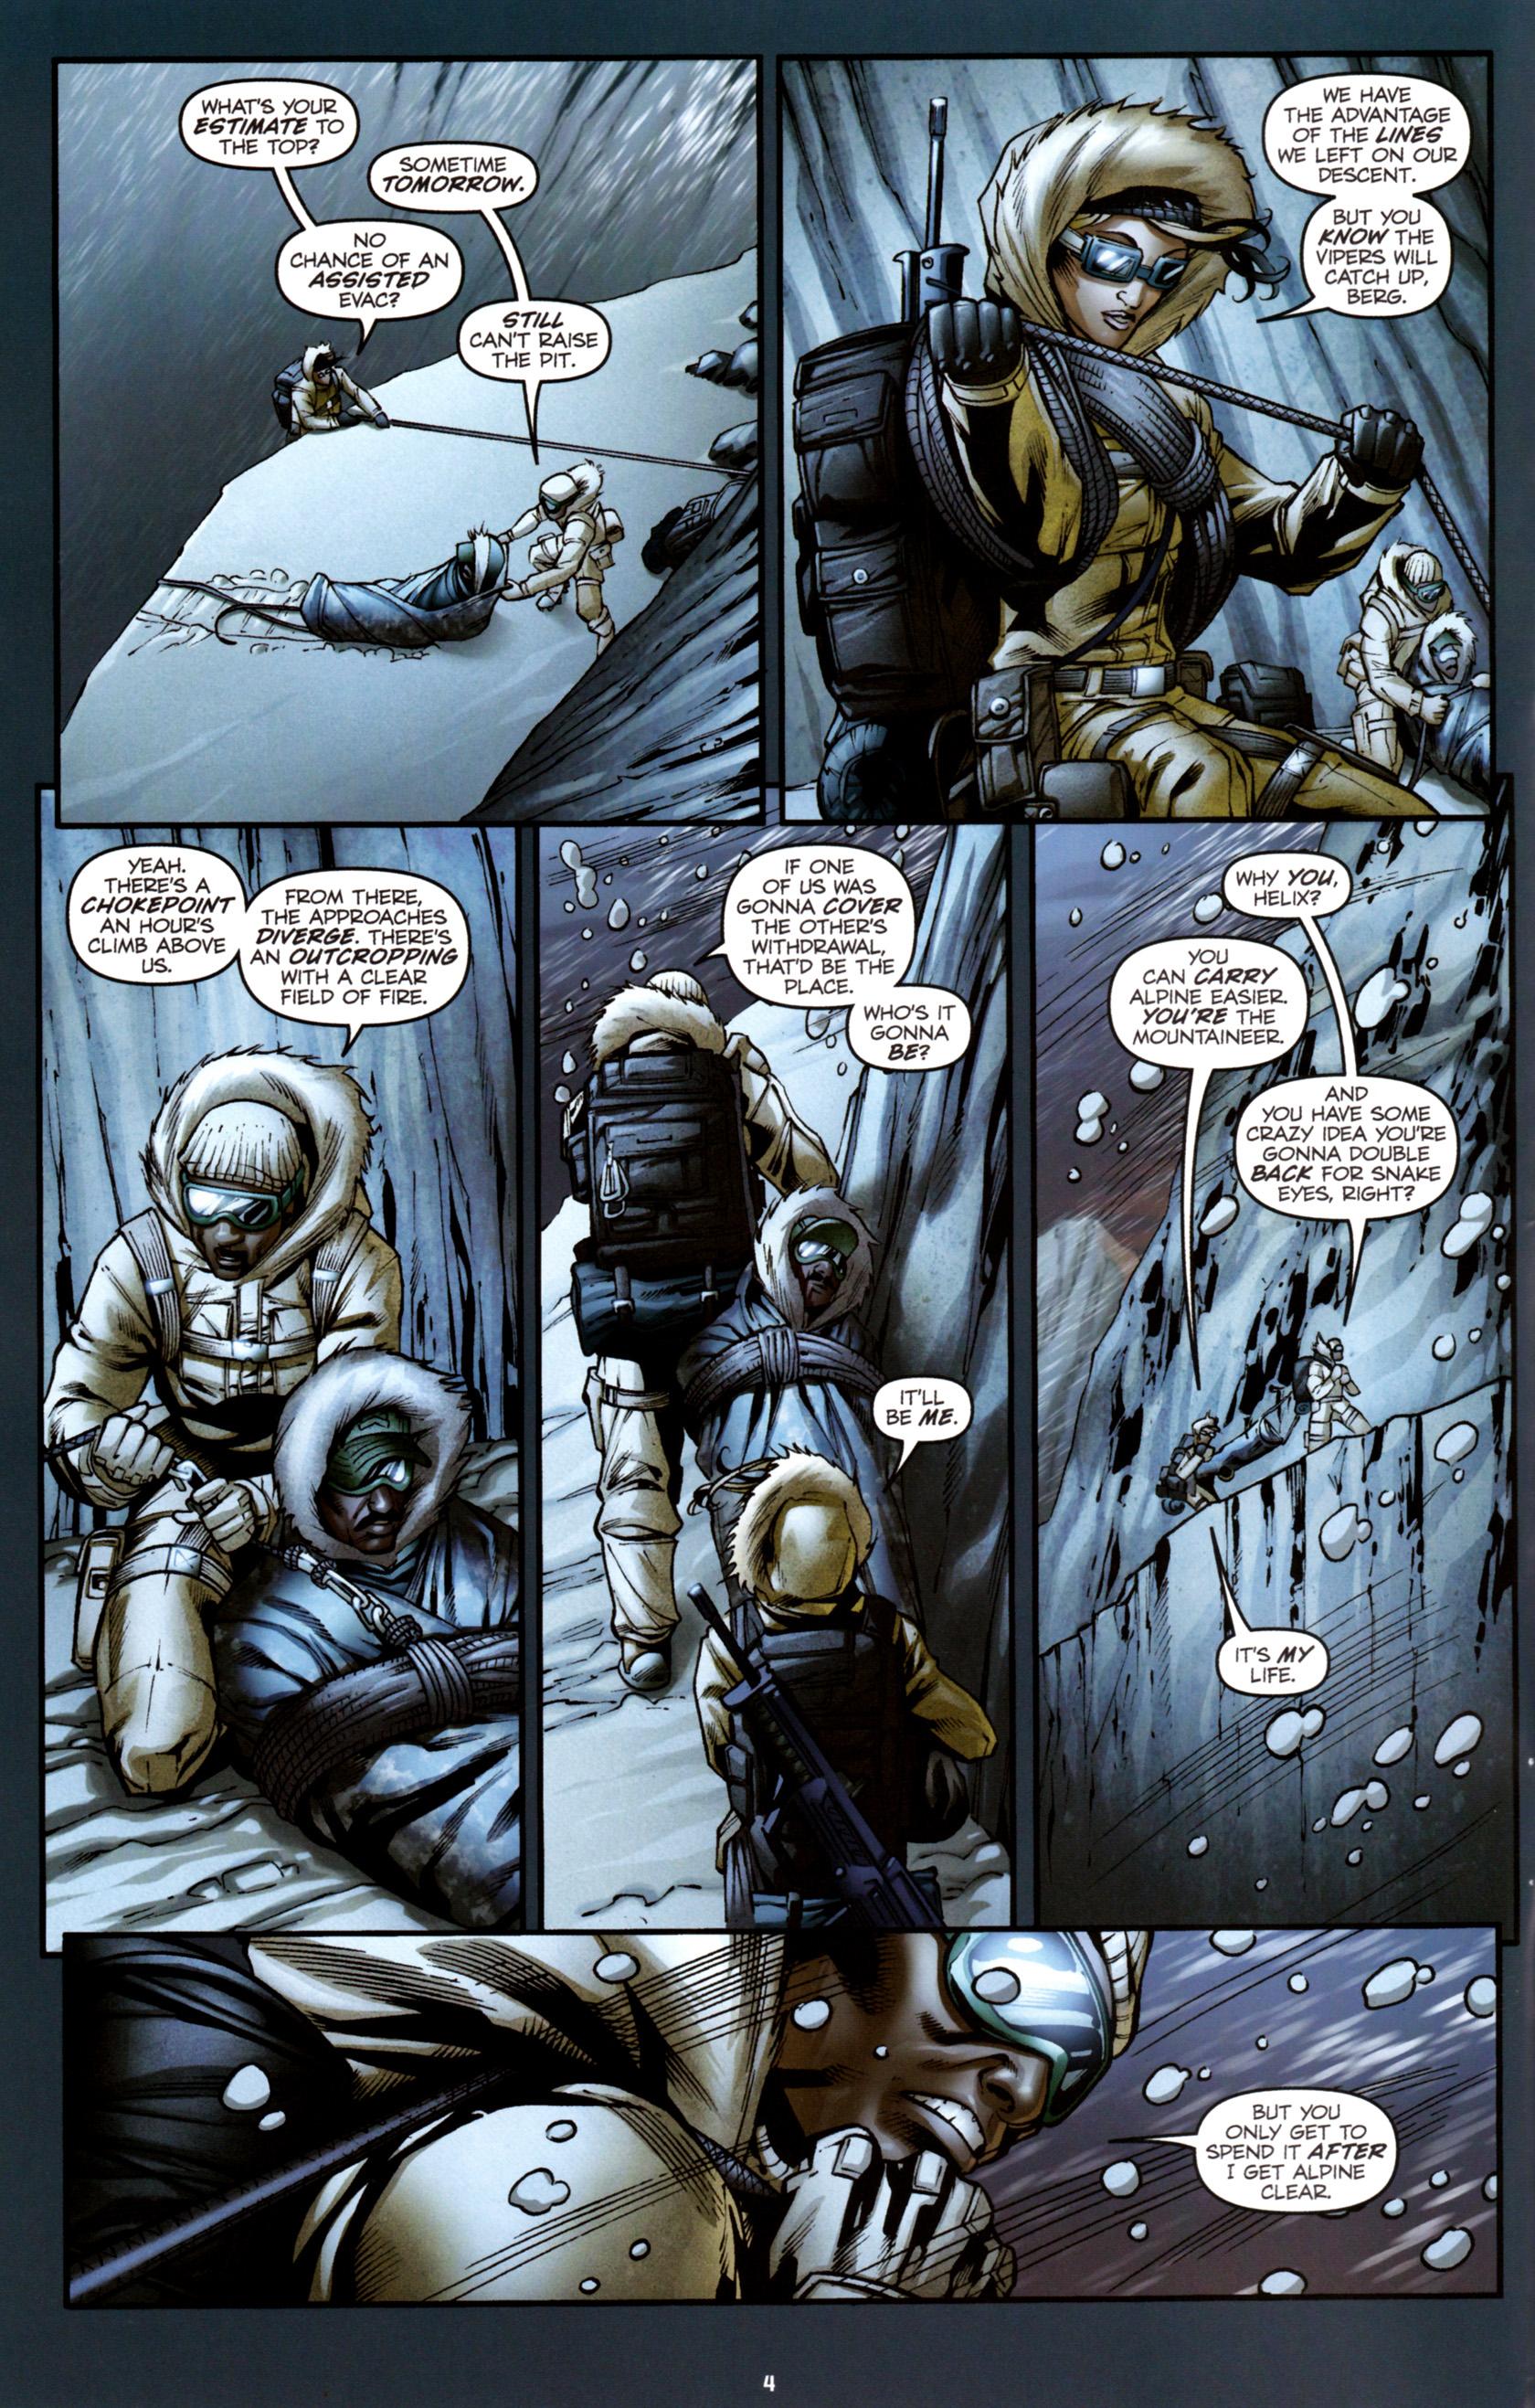 Read online G.I. Joe: Snake Eyes comic -  Issue #3 - 7